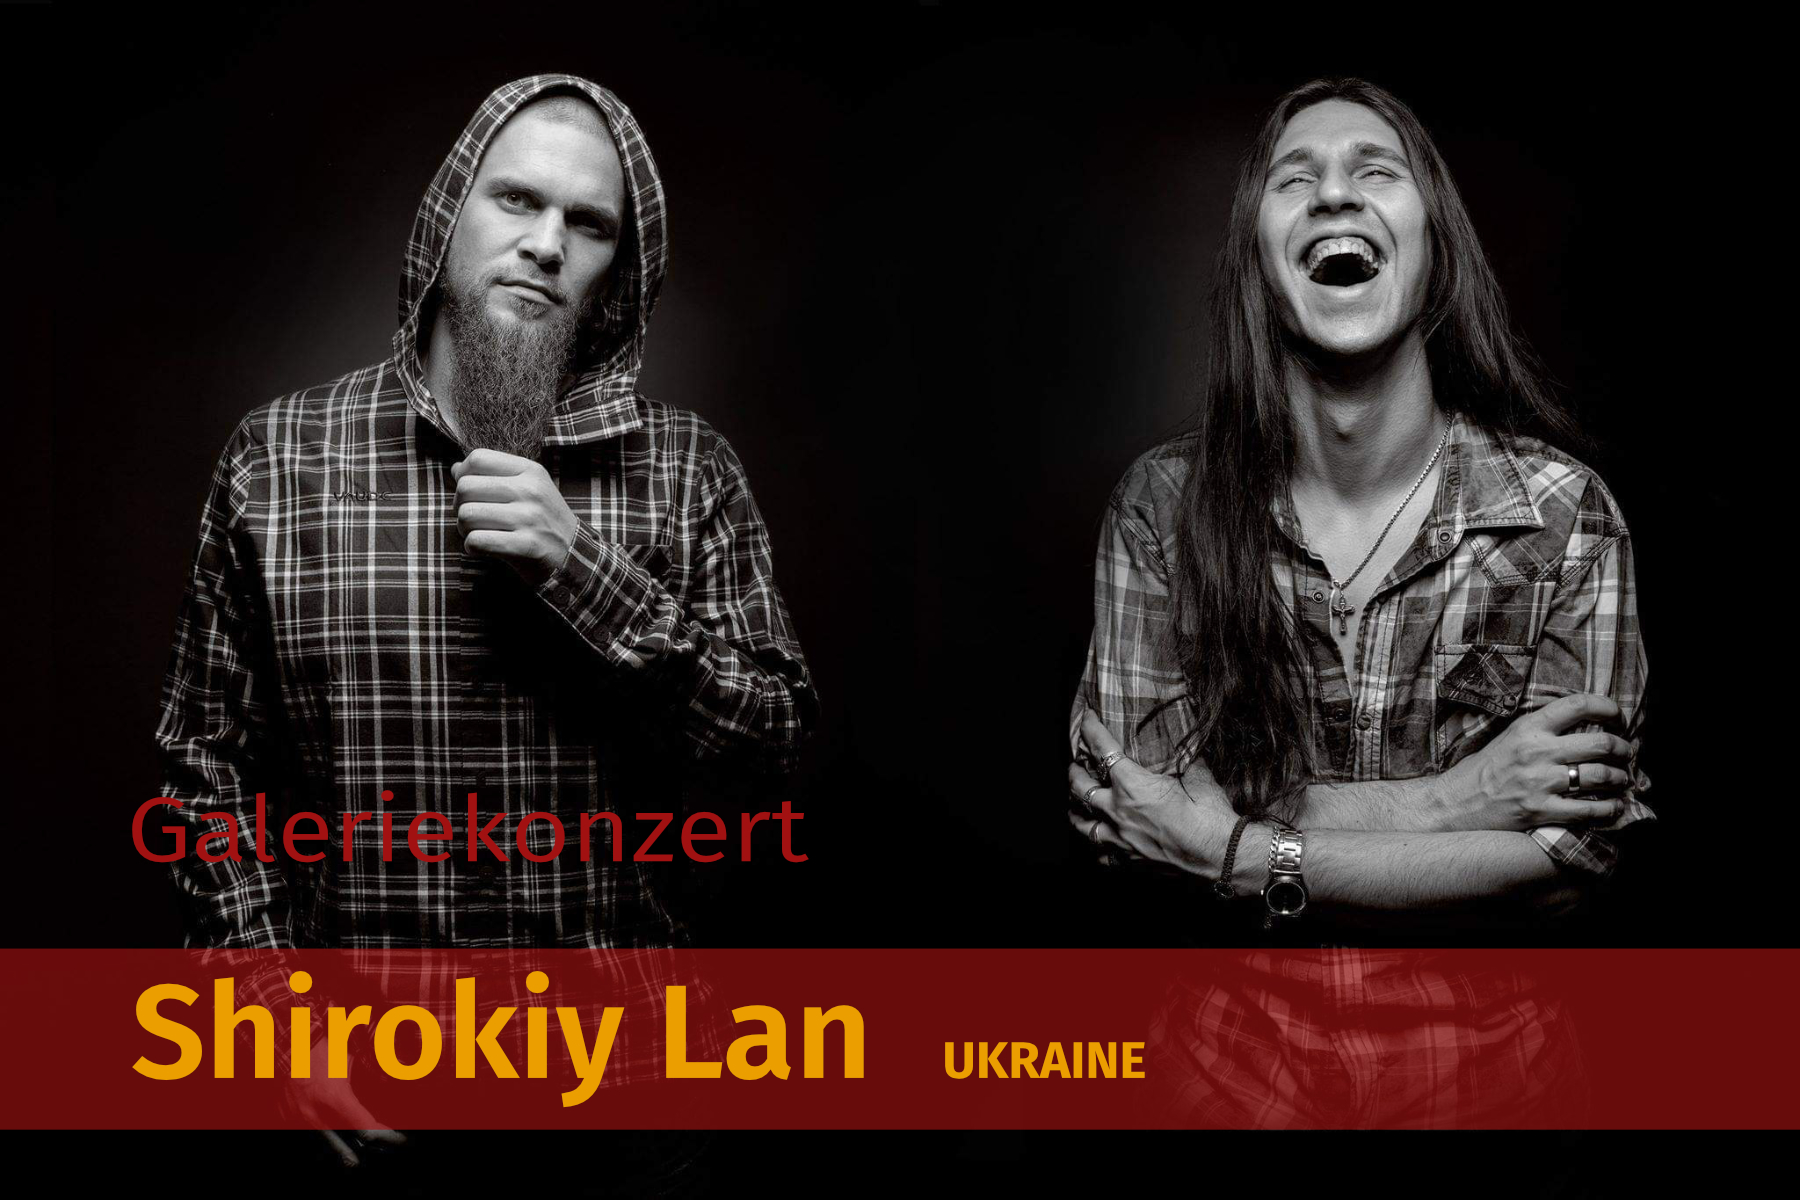 Galeriekonzert - Shirokiy Lan (Ukraine)